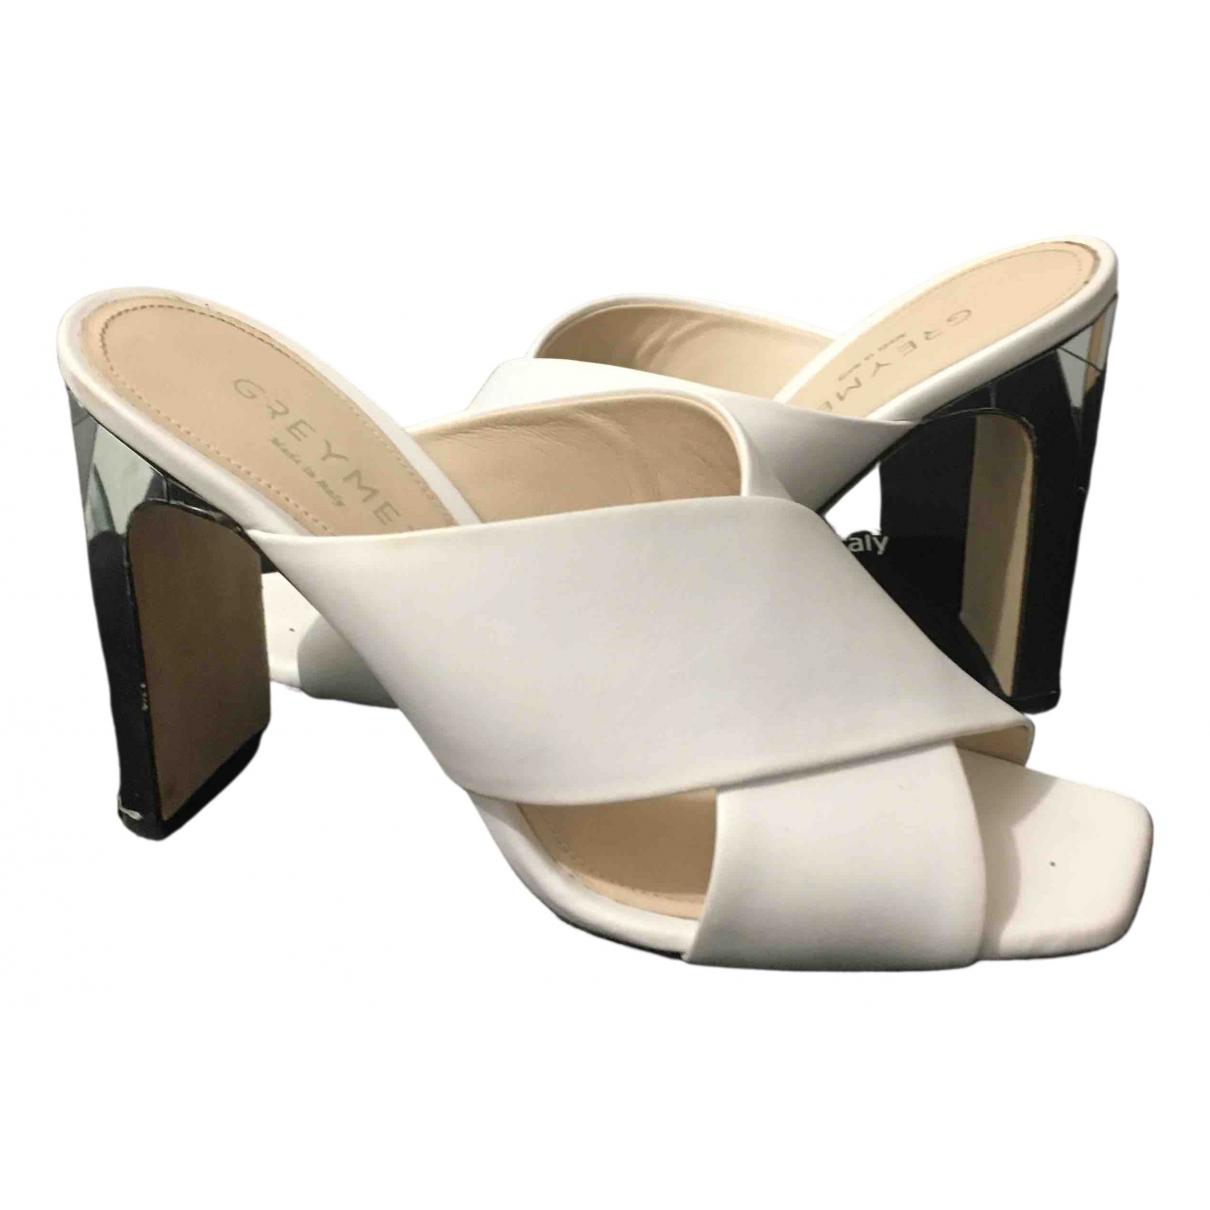 Sandalias de Cuero Greymer